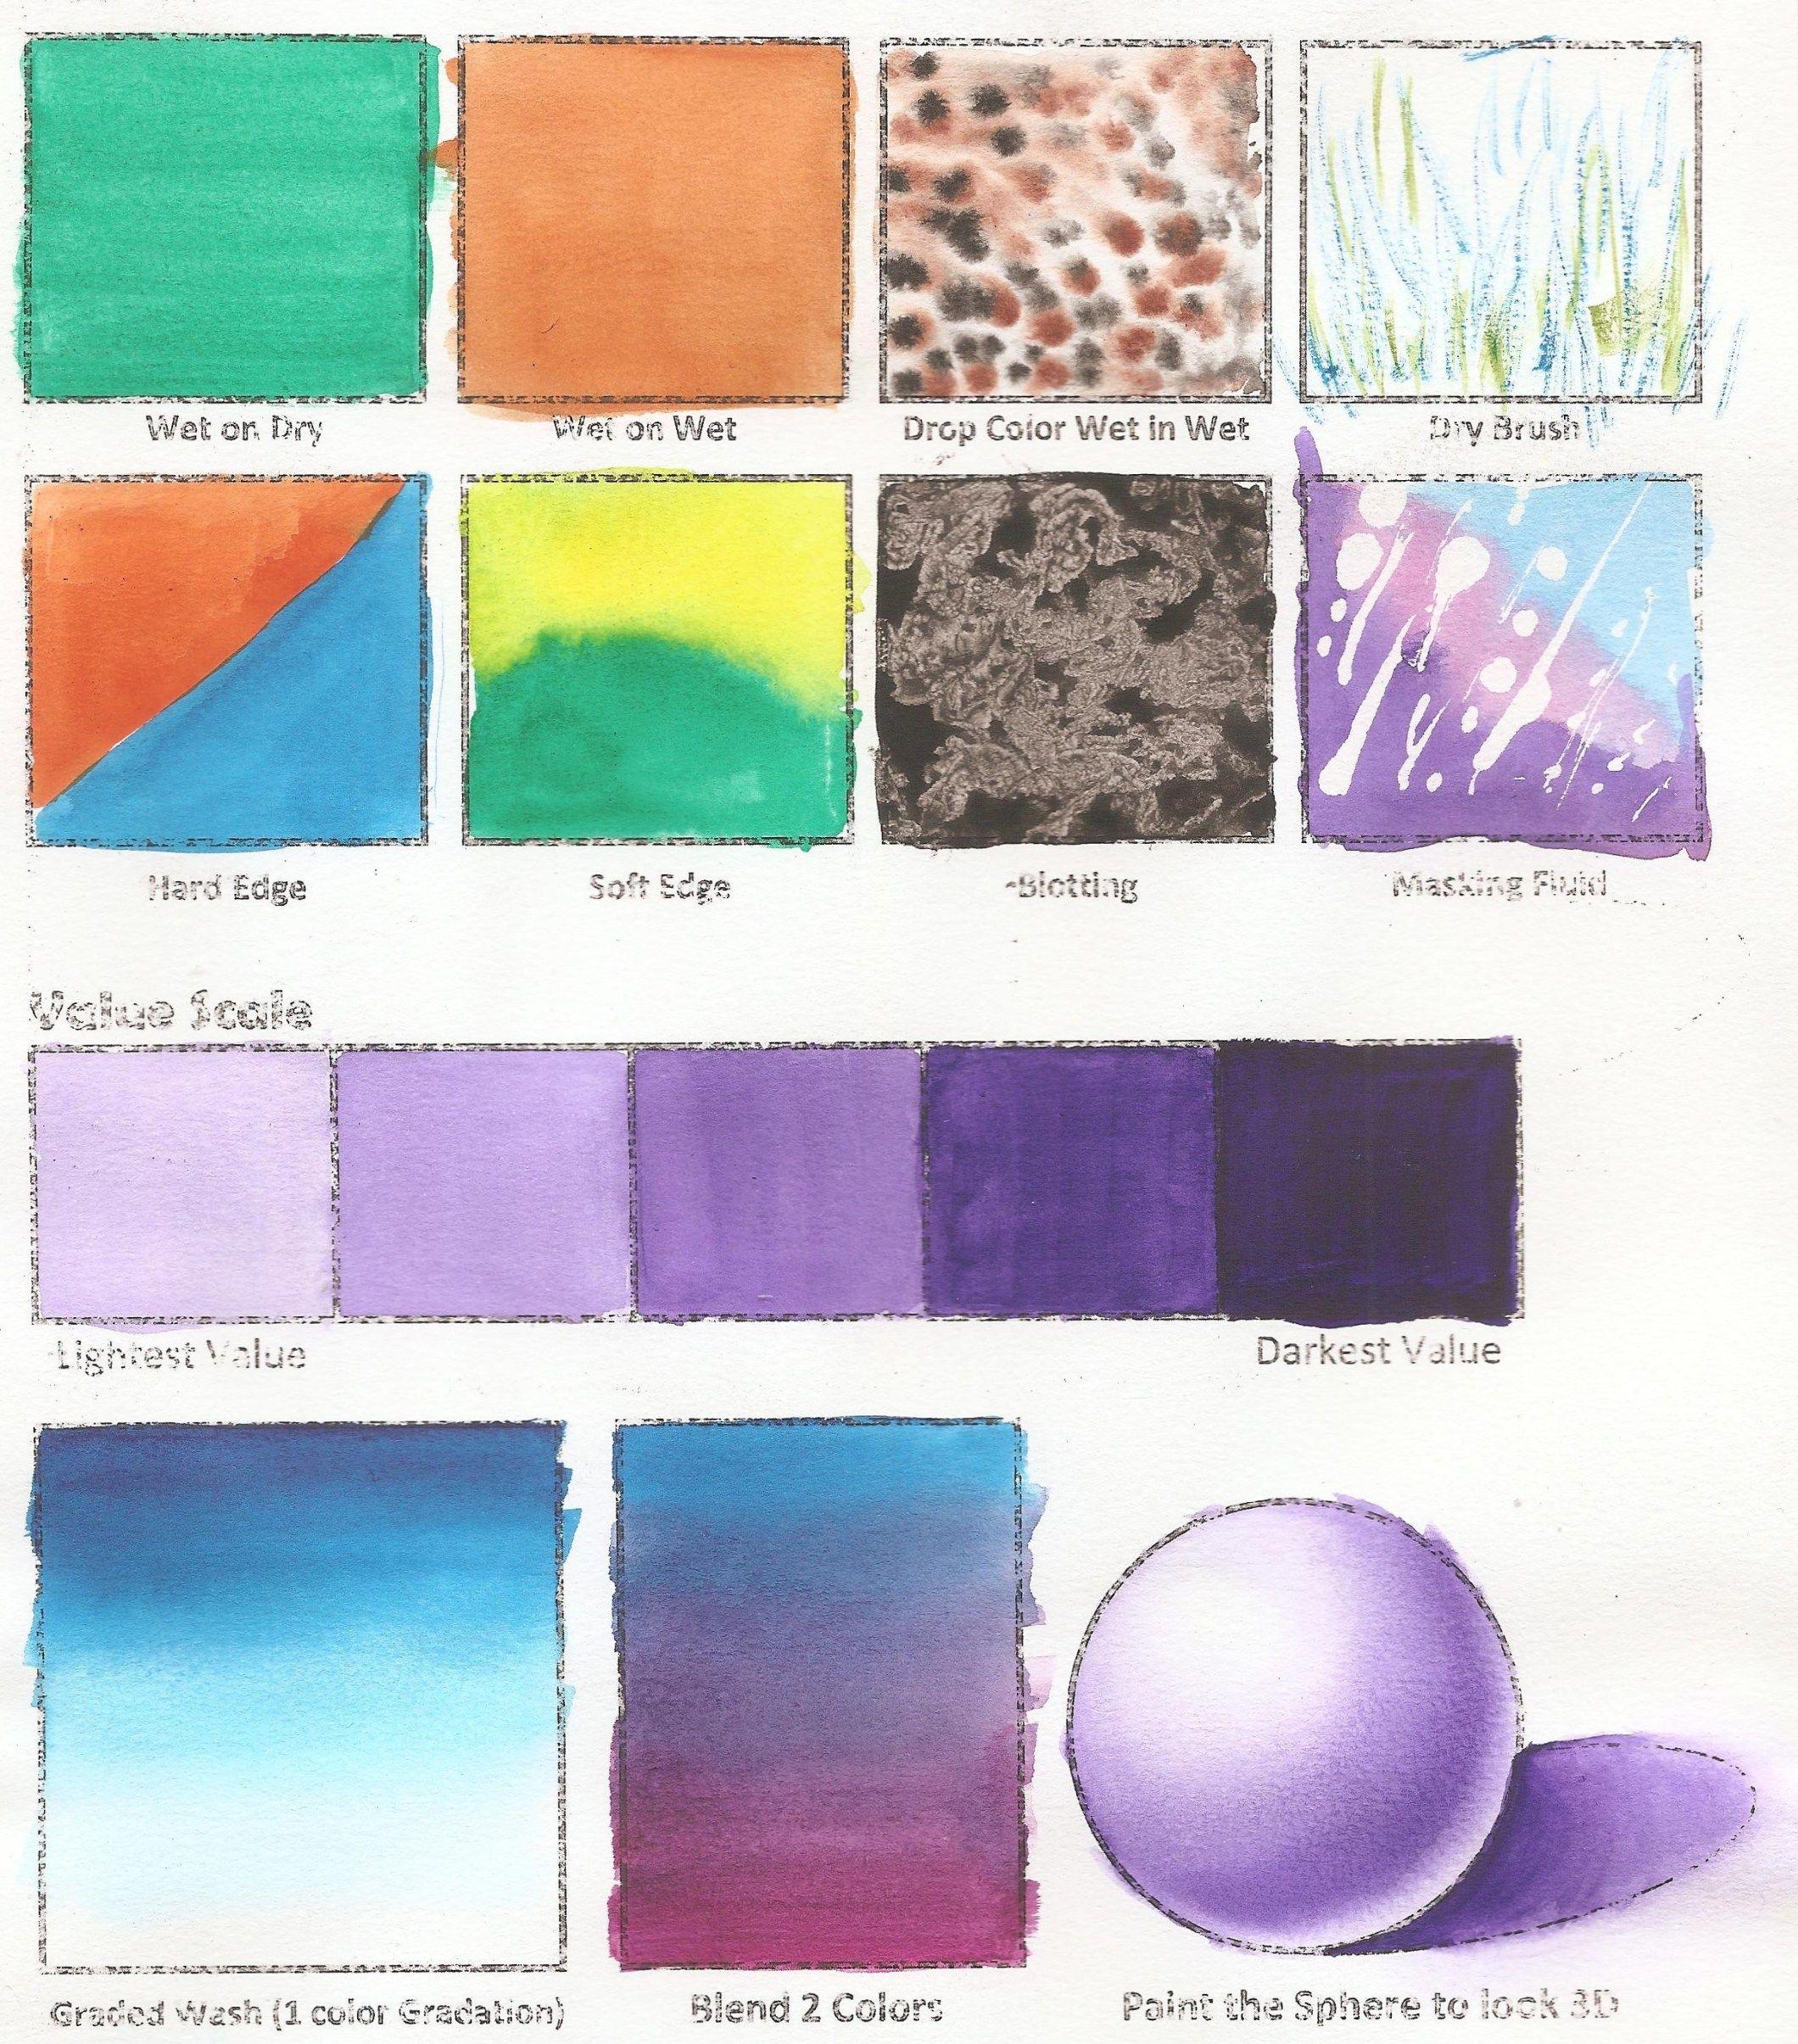 Basic Watercolor Painting Techniques Lesson Plan